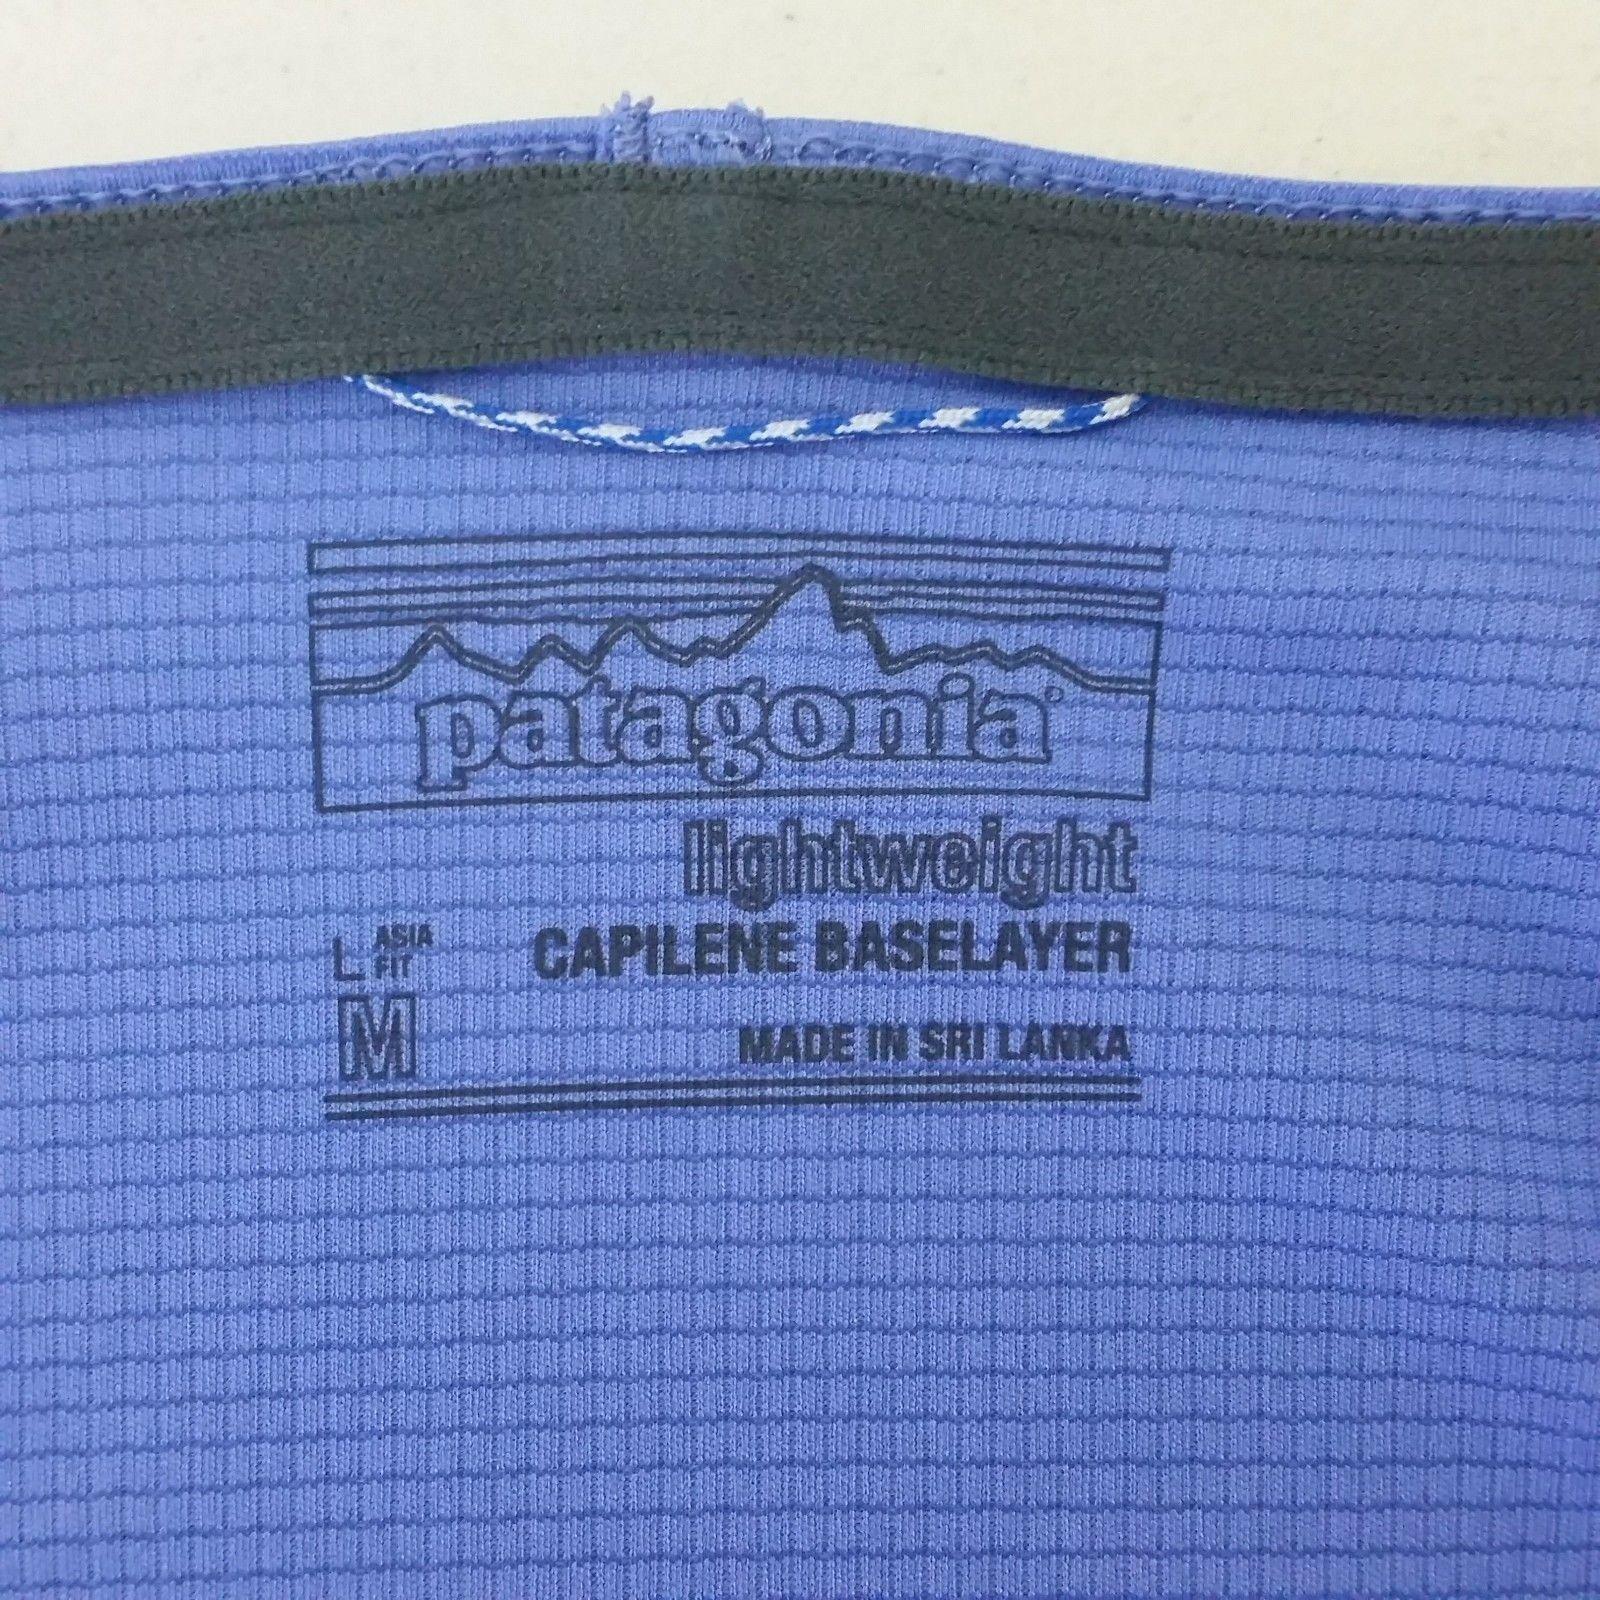 Patagonia Womens Med Athletic Purple Shirt Capilene Base Layer Hiking Climbing